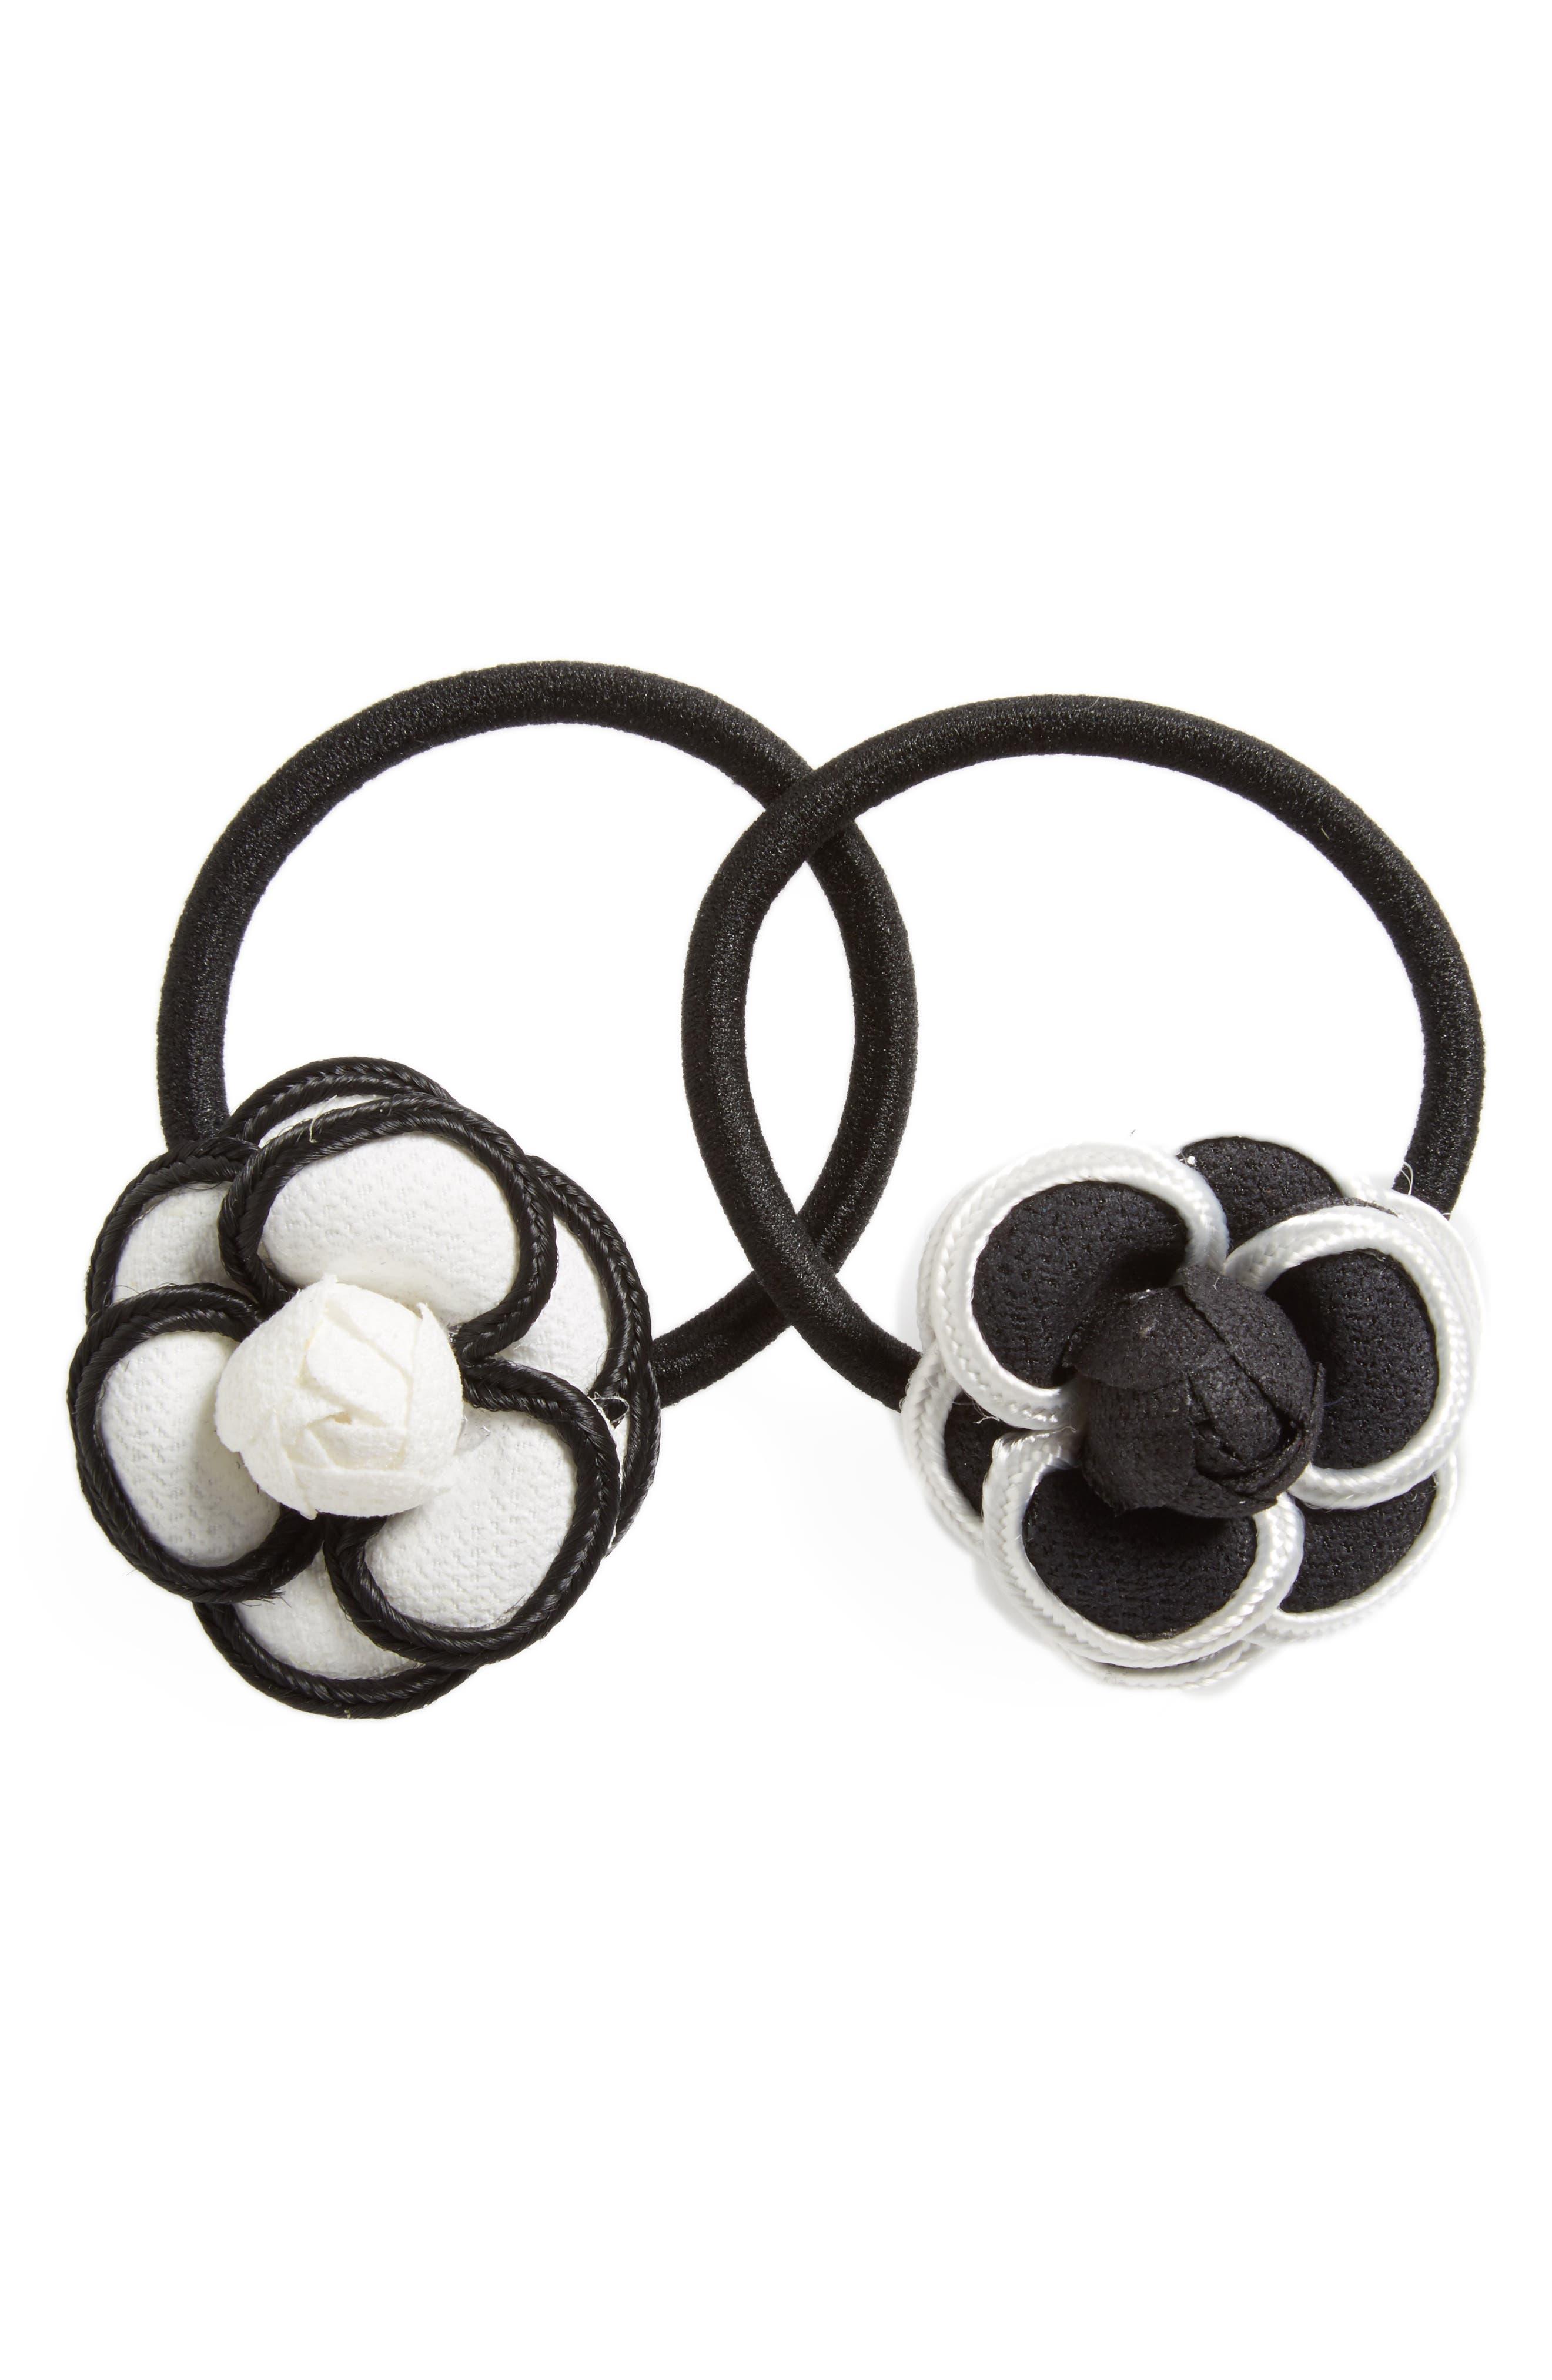 2-Pack Floral Ponytail Holders,                         Main,                         color, Black/White